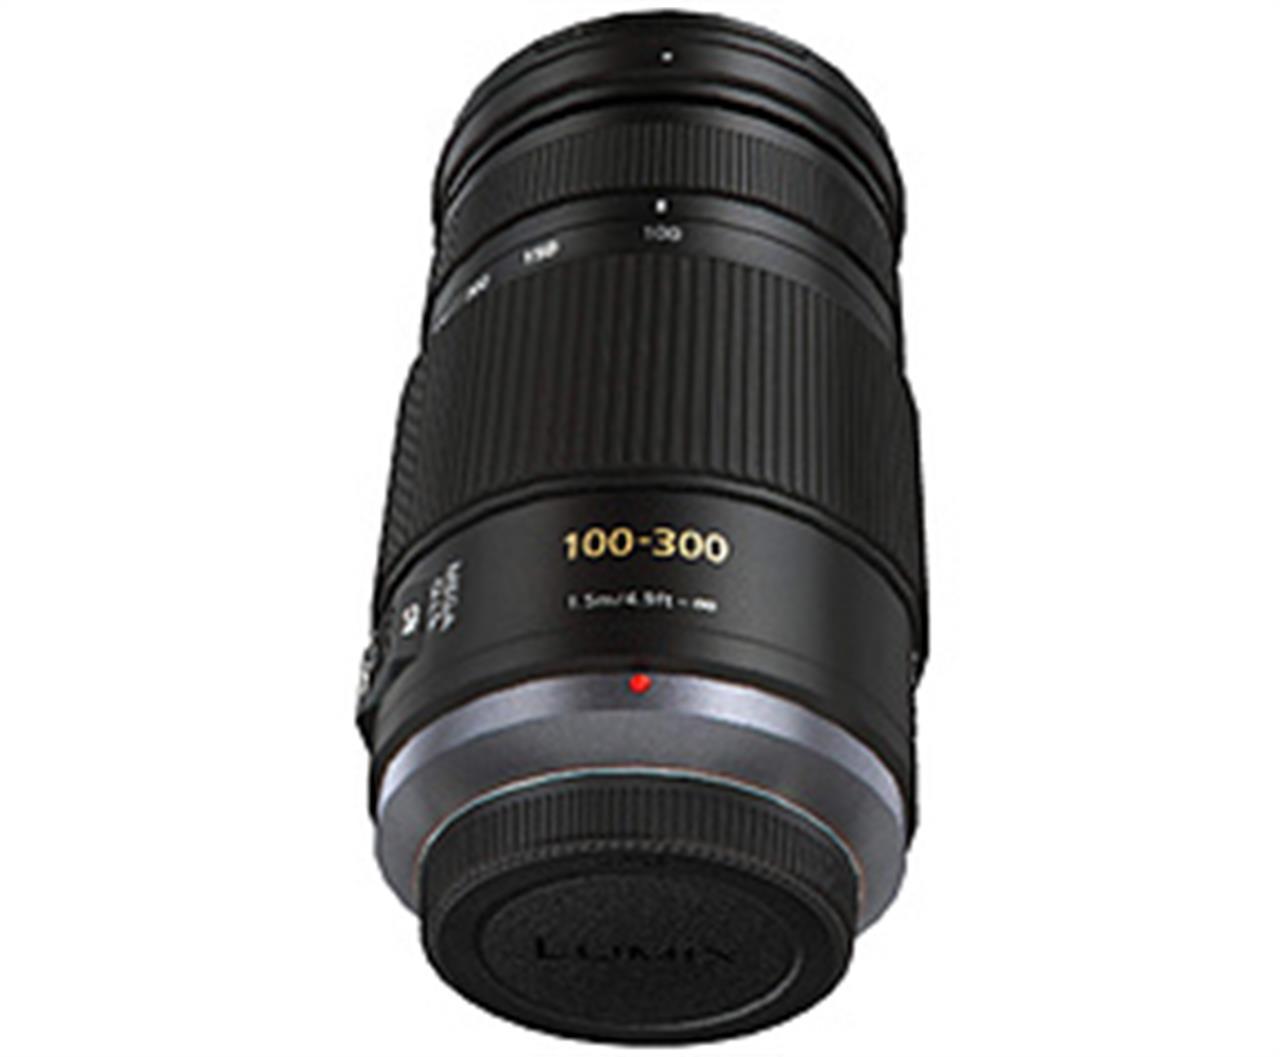 5025232862726__panasonic_g_lens_100-300.jpg